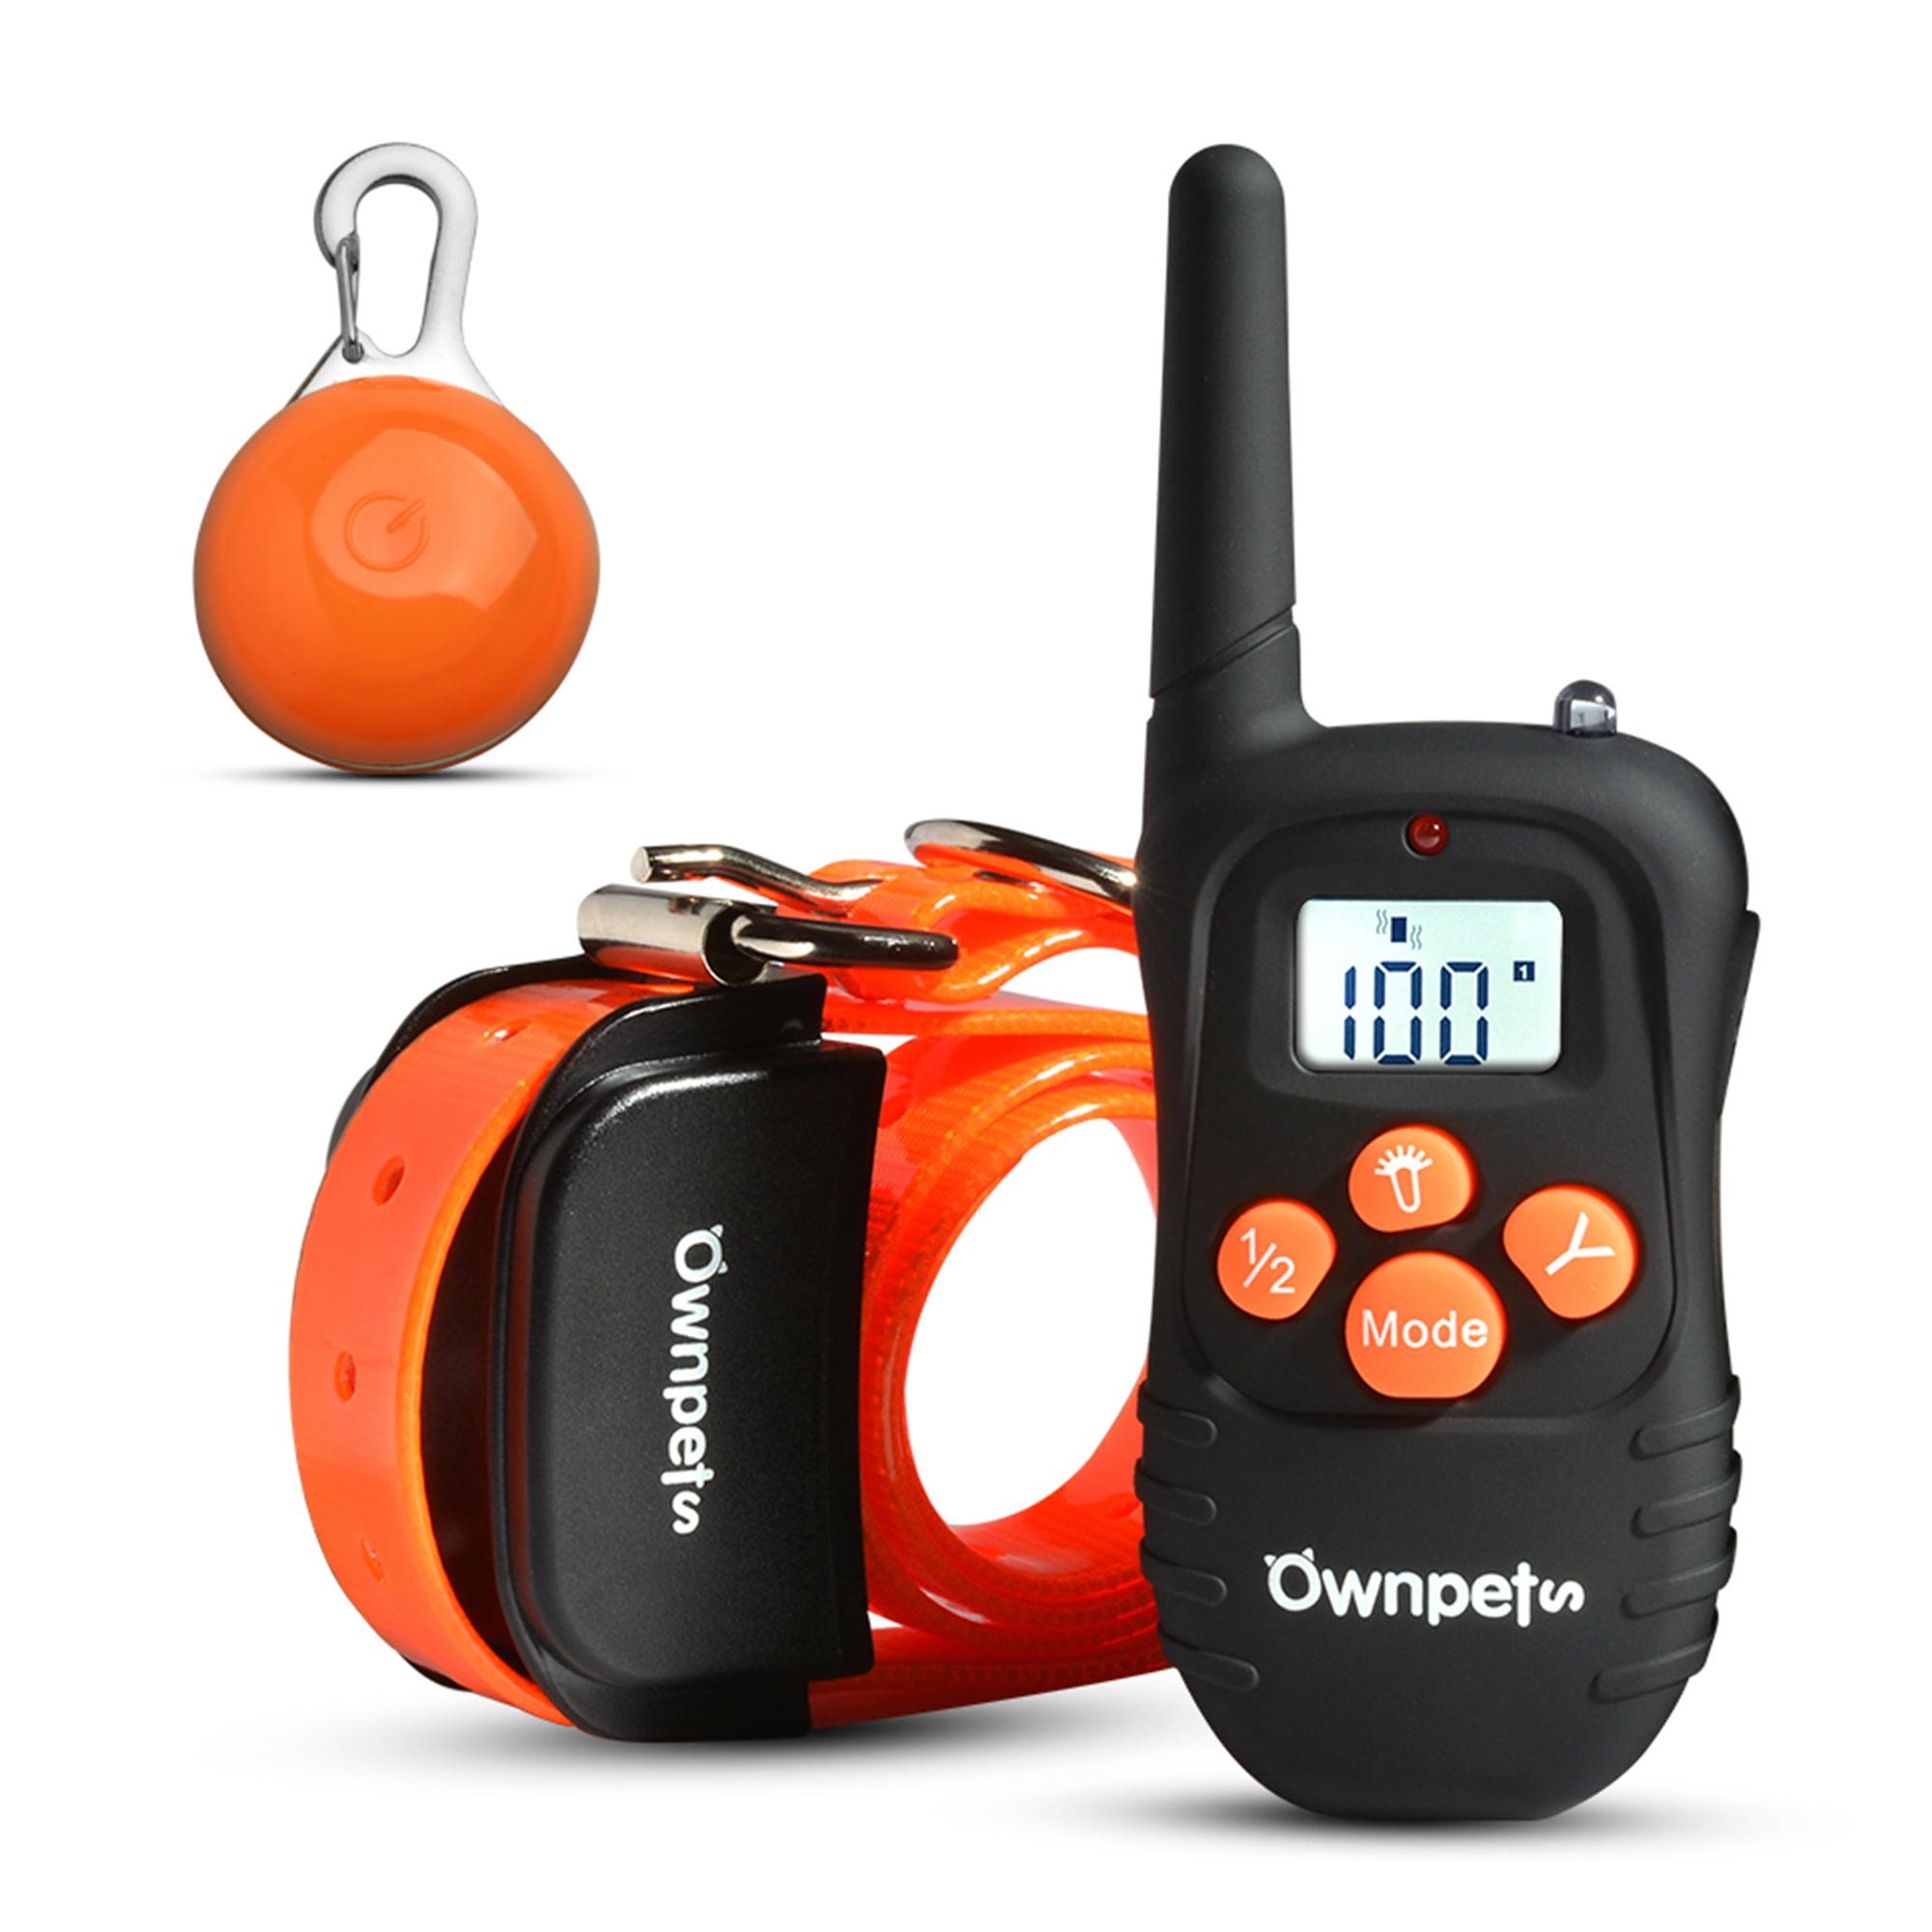 Ownpets 330 Yard 100levels Rechargeable Rainproof  LCD Shock Vibra Remote Pet Dog Training Collar